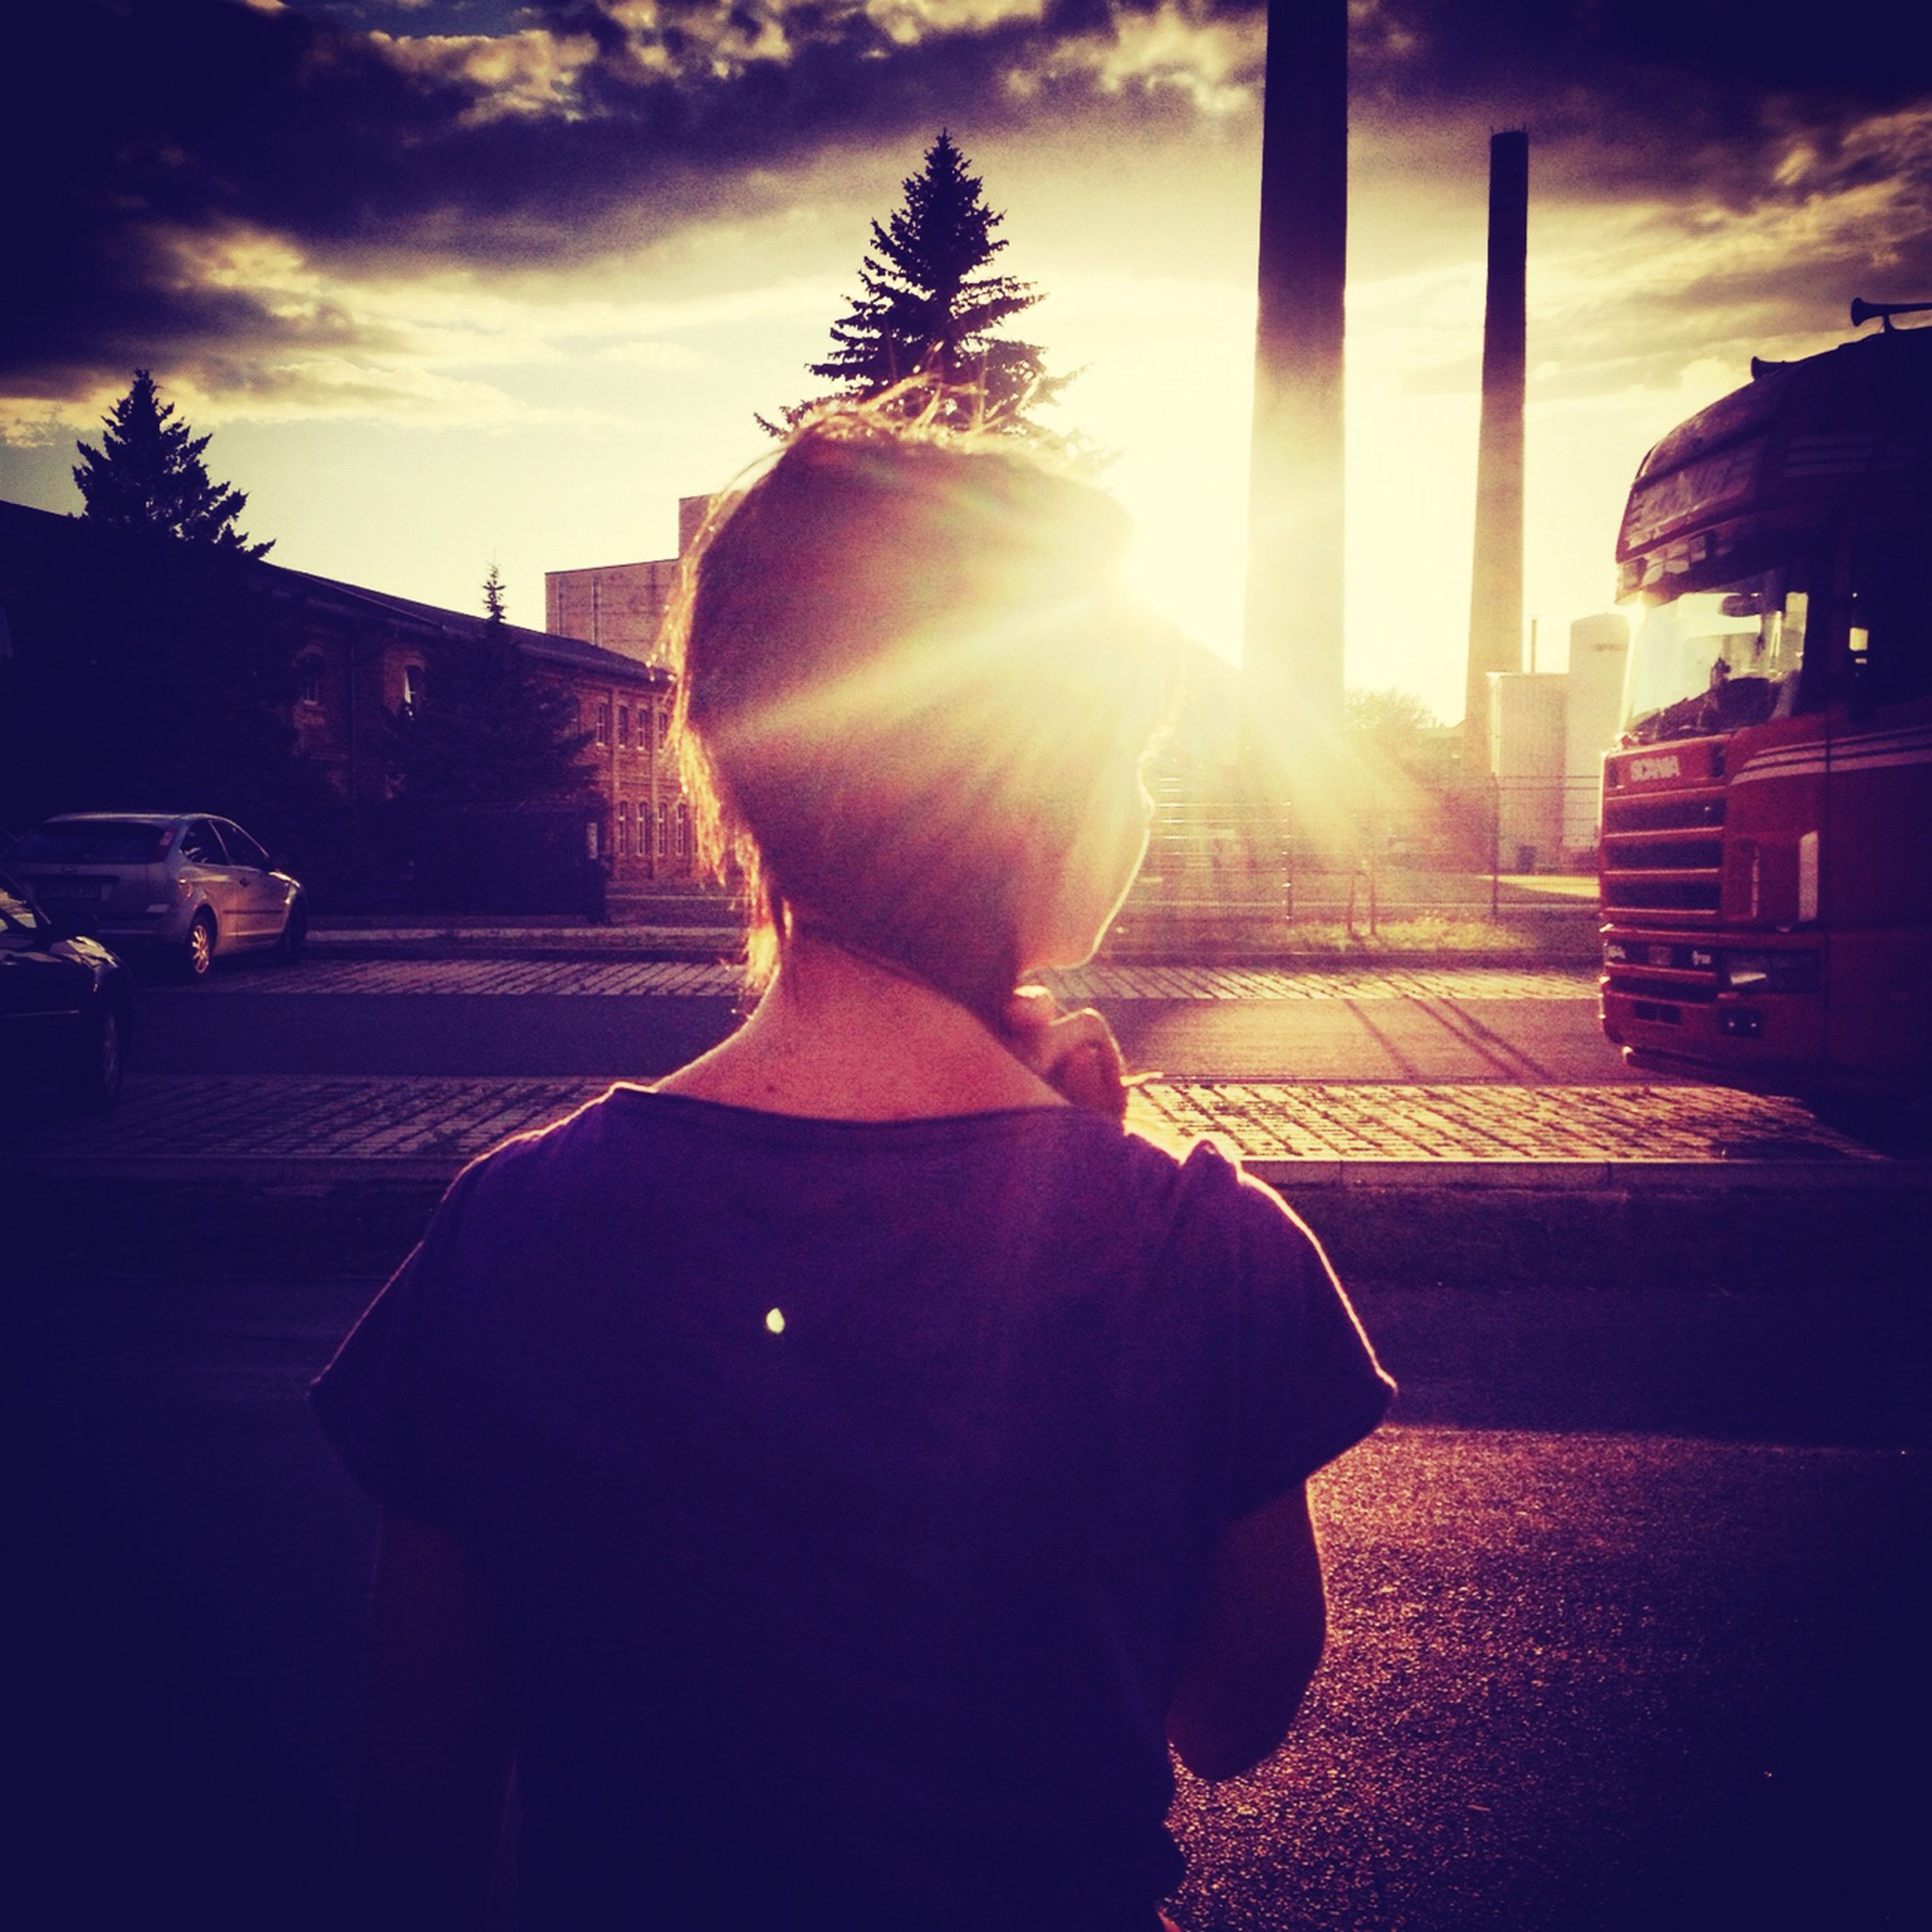 sunlight, sunbeam, sun, sunset, sky, silhouette, lens flare, building exterior, built structure, architecture, street, car, lifestyles, tree, transportation, shadow, leisure activity, city